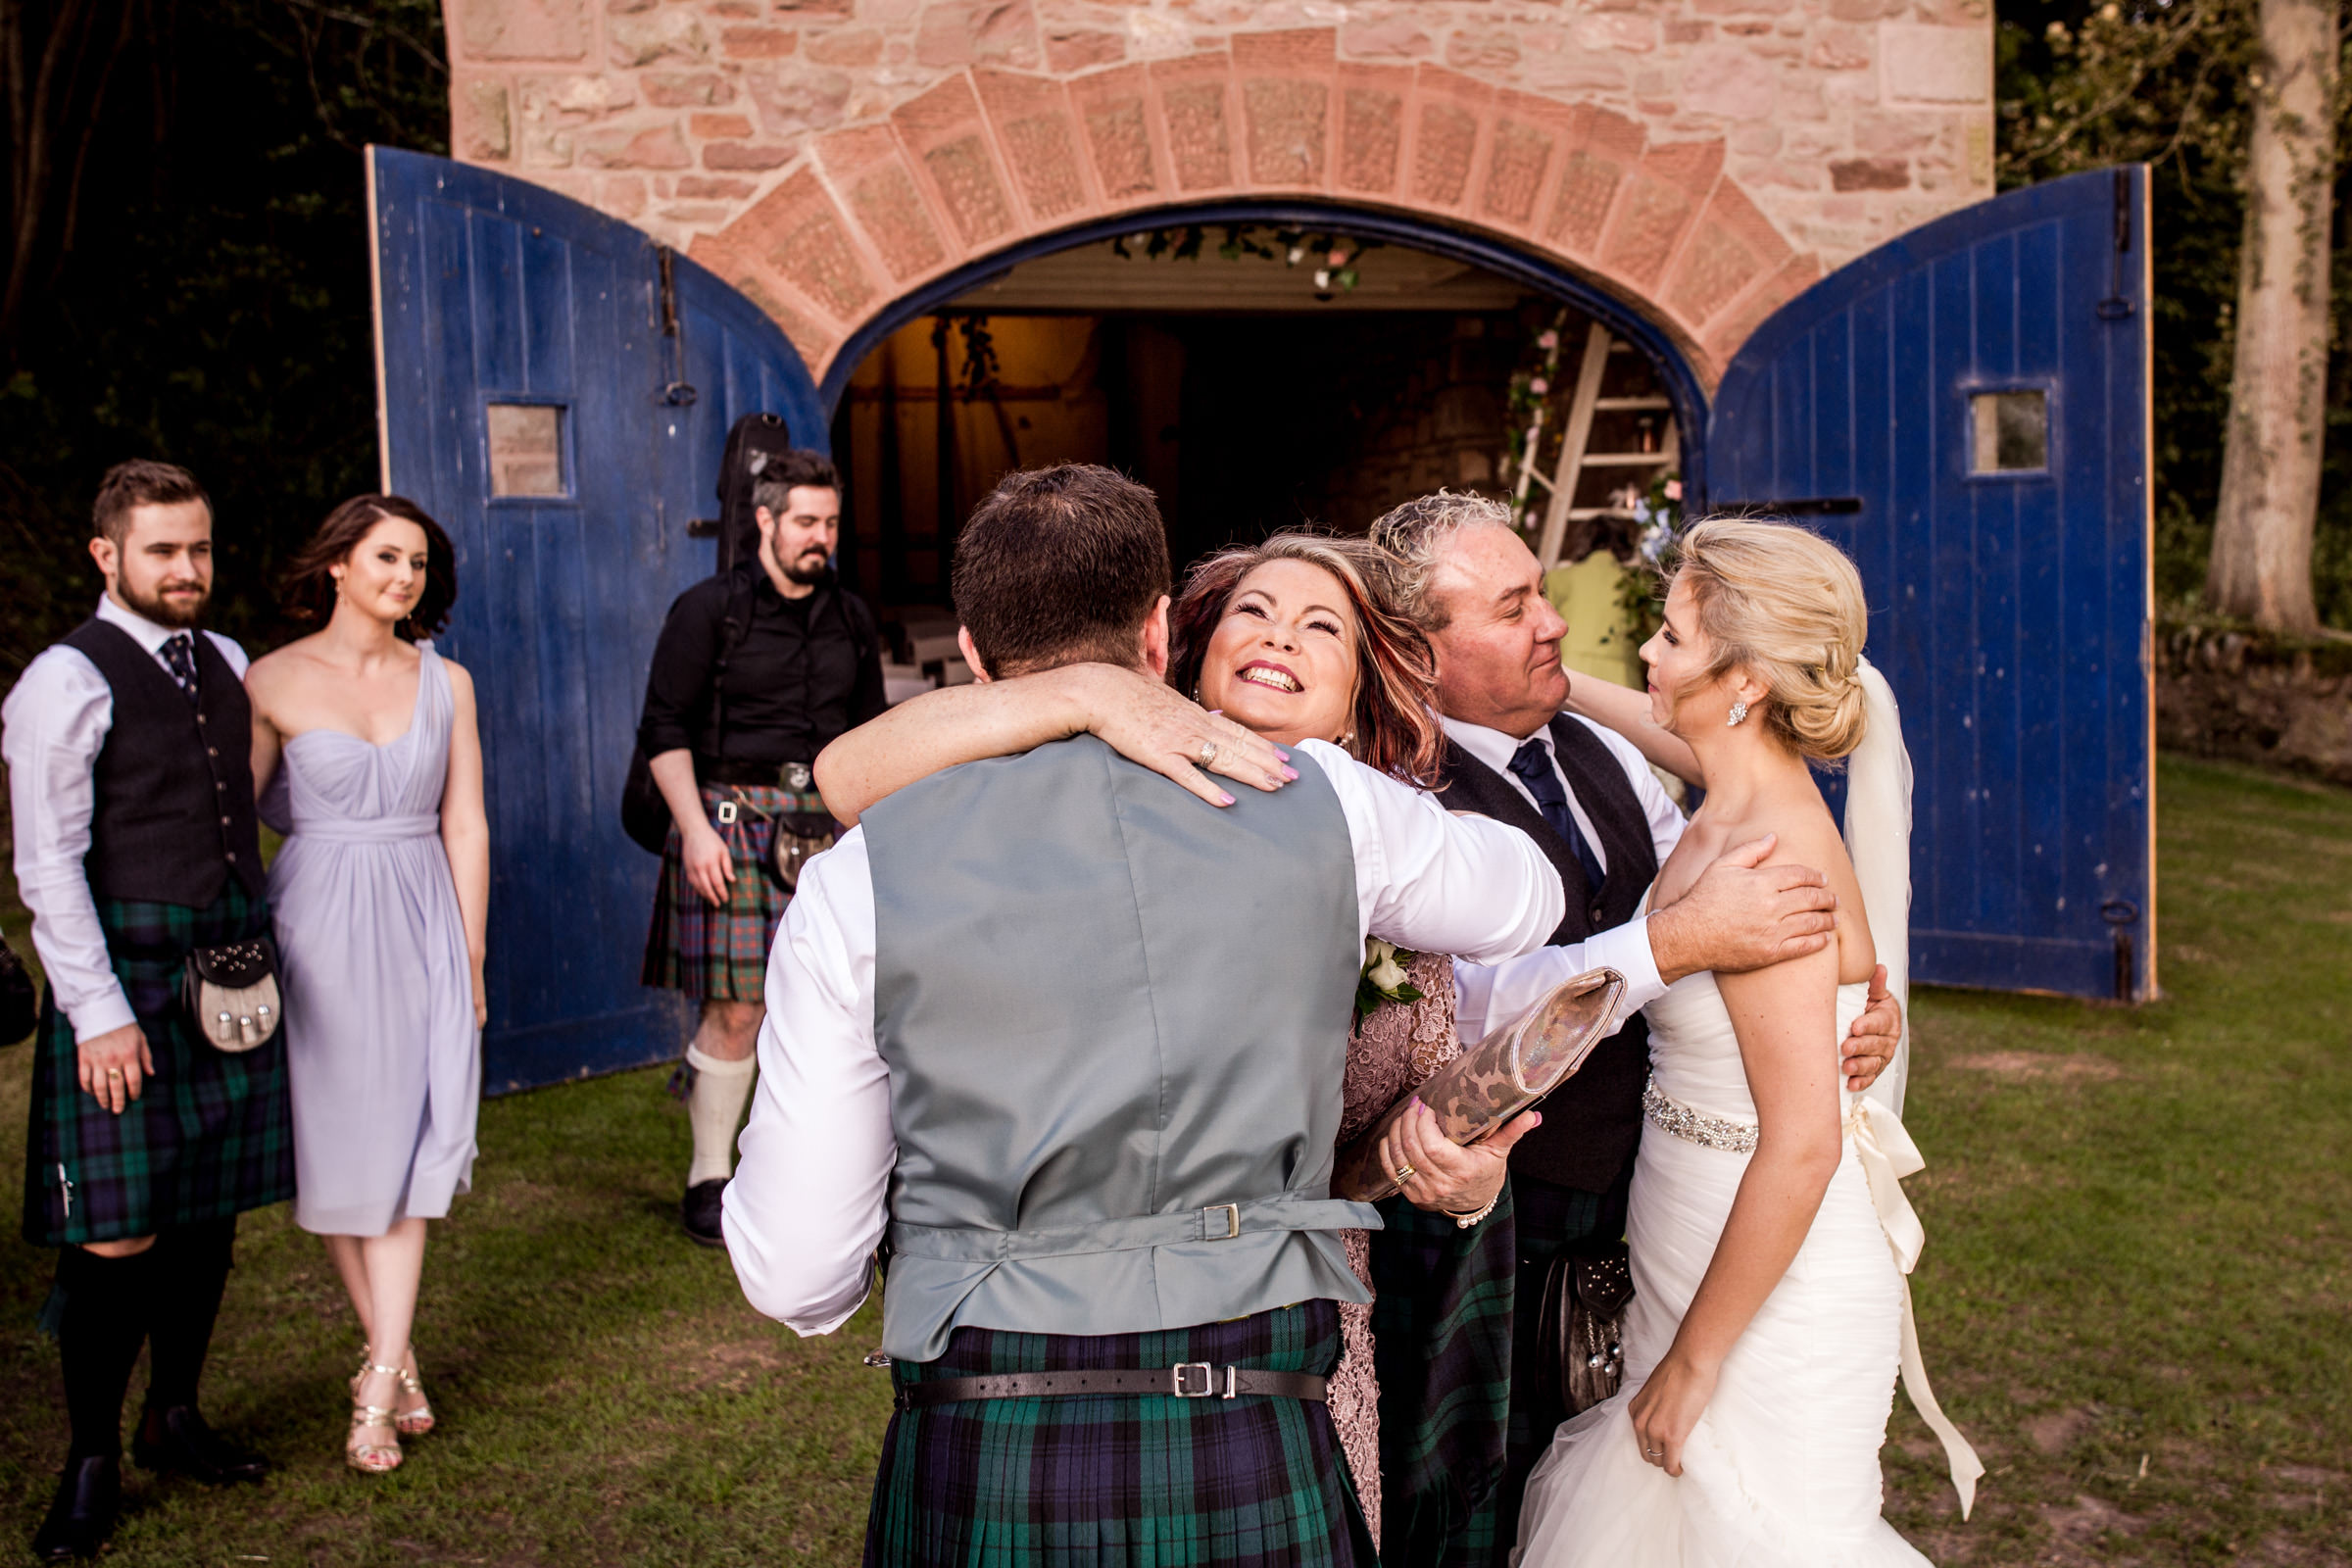 Documentart wedding photographers Berwick-upon-Tweed 012.jpg